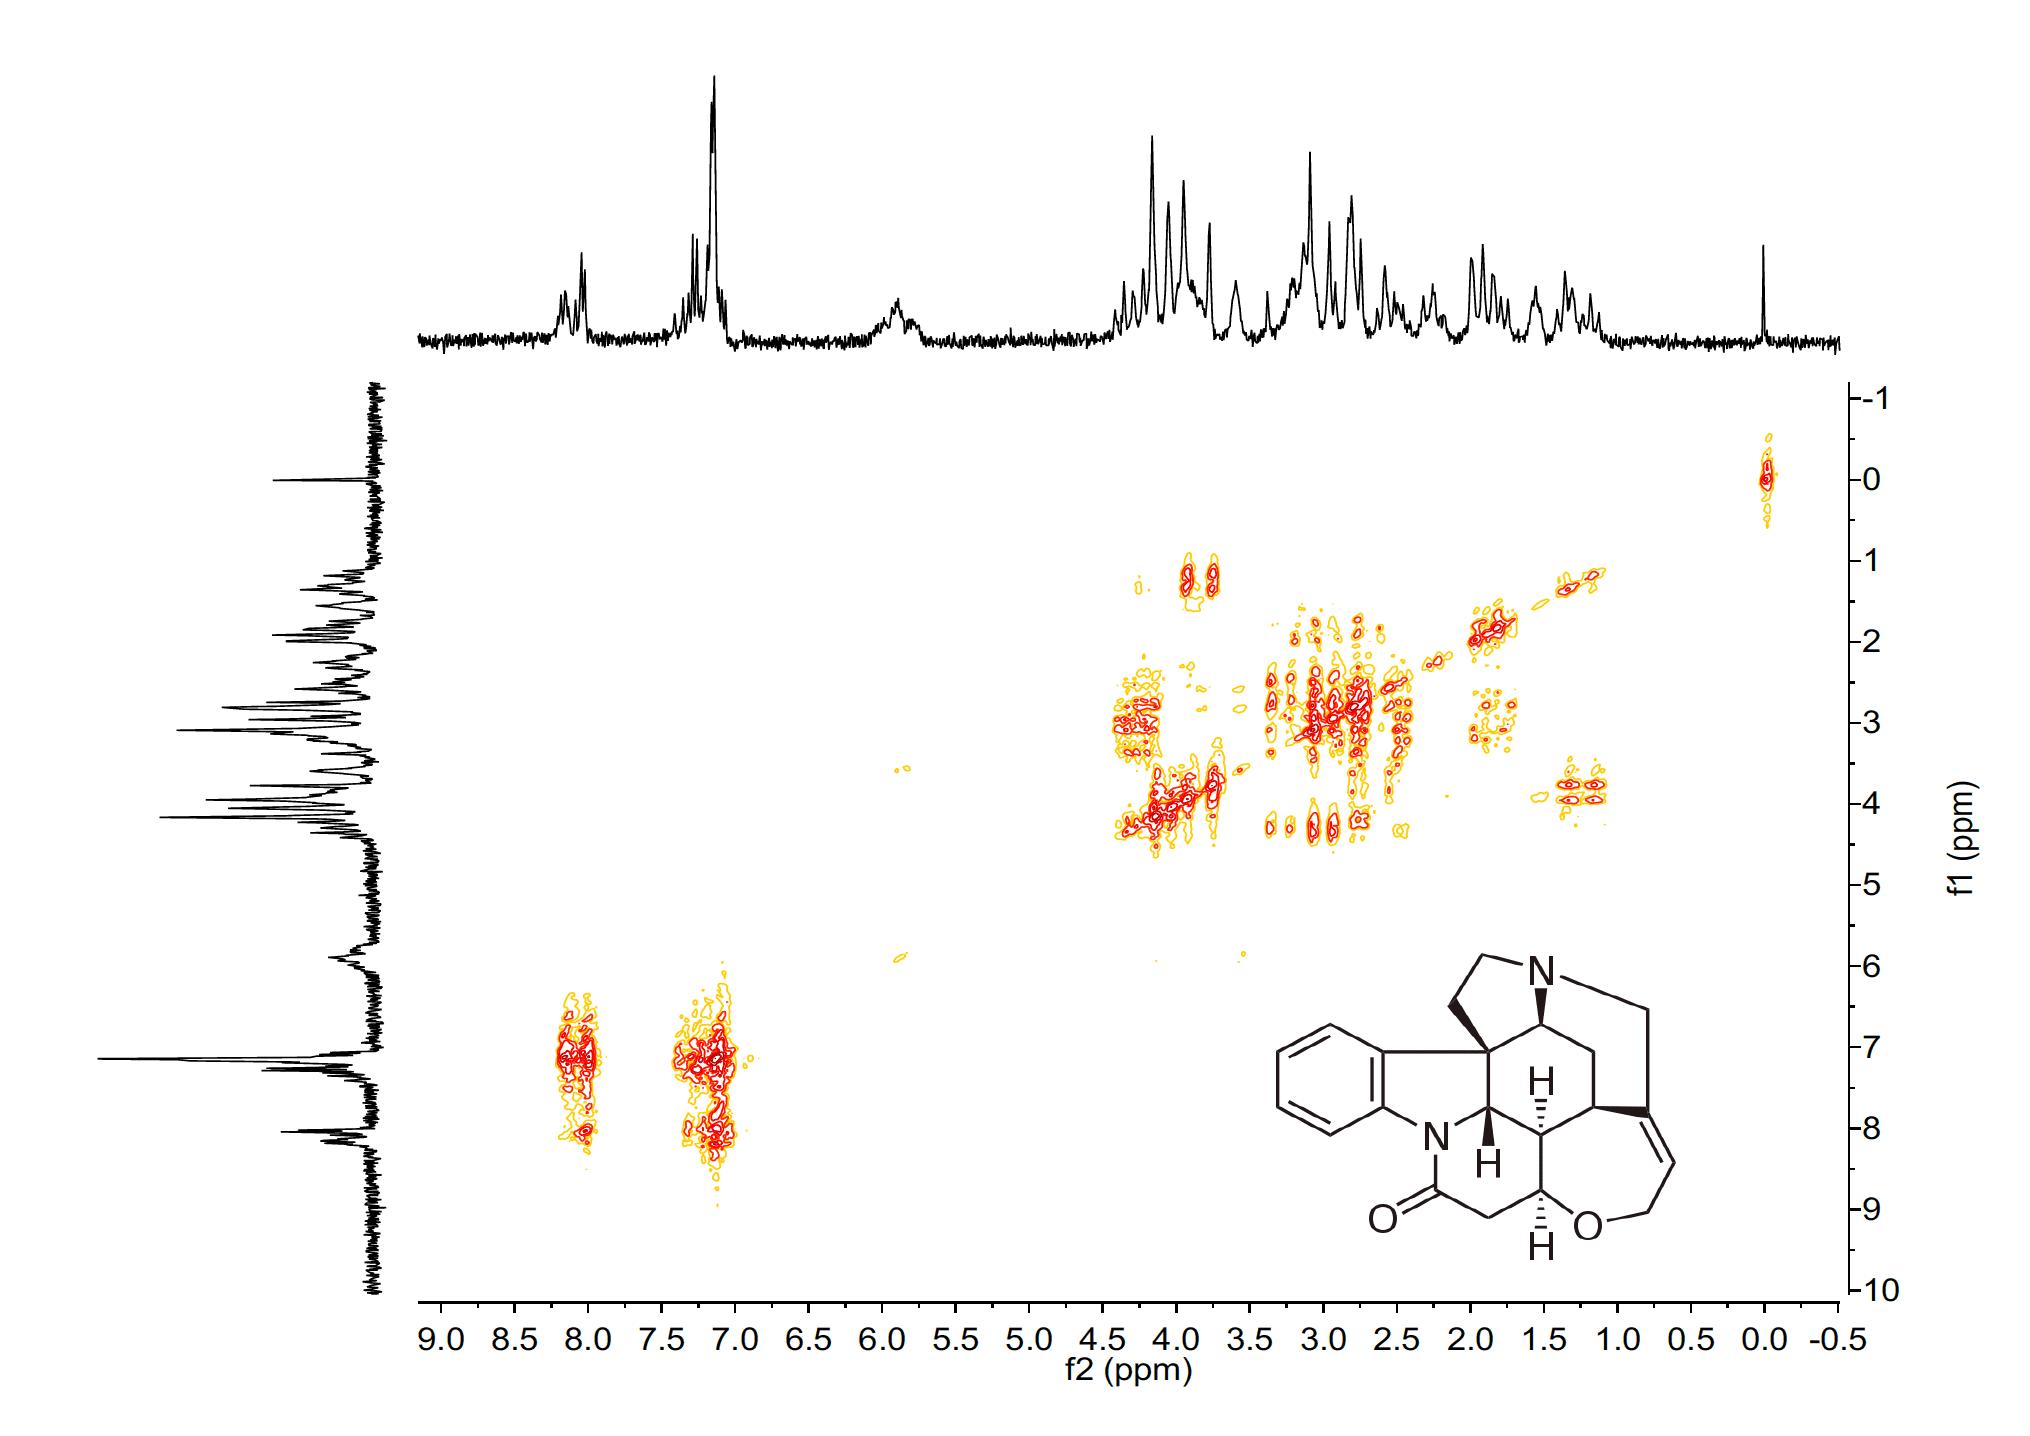 Anasazi Instruments Strychnine COSY - 2D spectrum graph